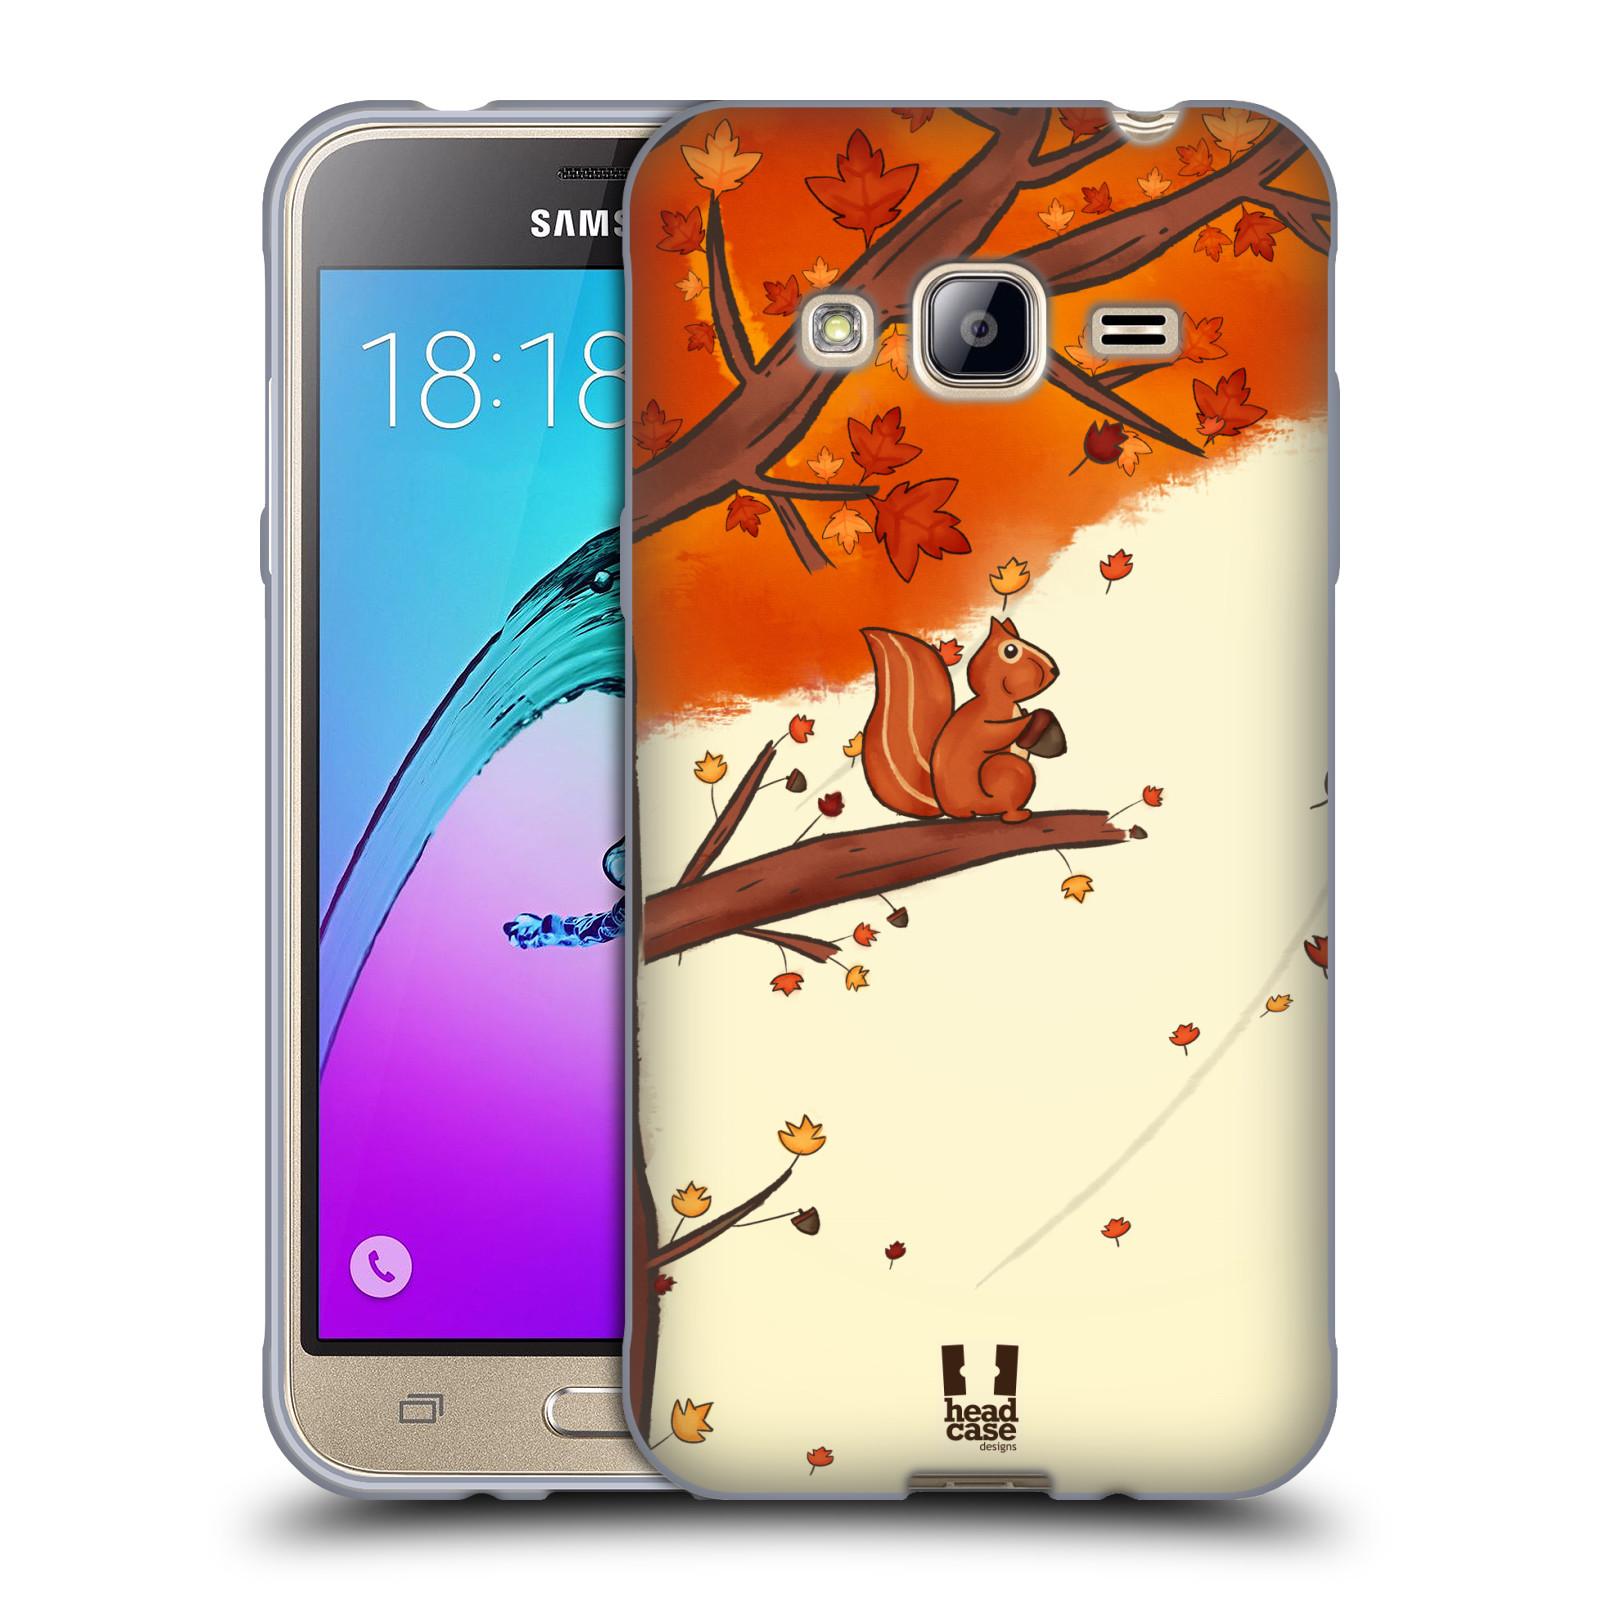 HEAD CASE silikonový obal na mobil Samsung Galaxy J3, J3 2016 vzor podzimní zvířátka veverka